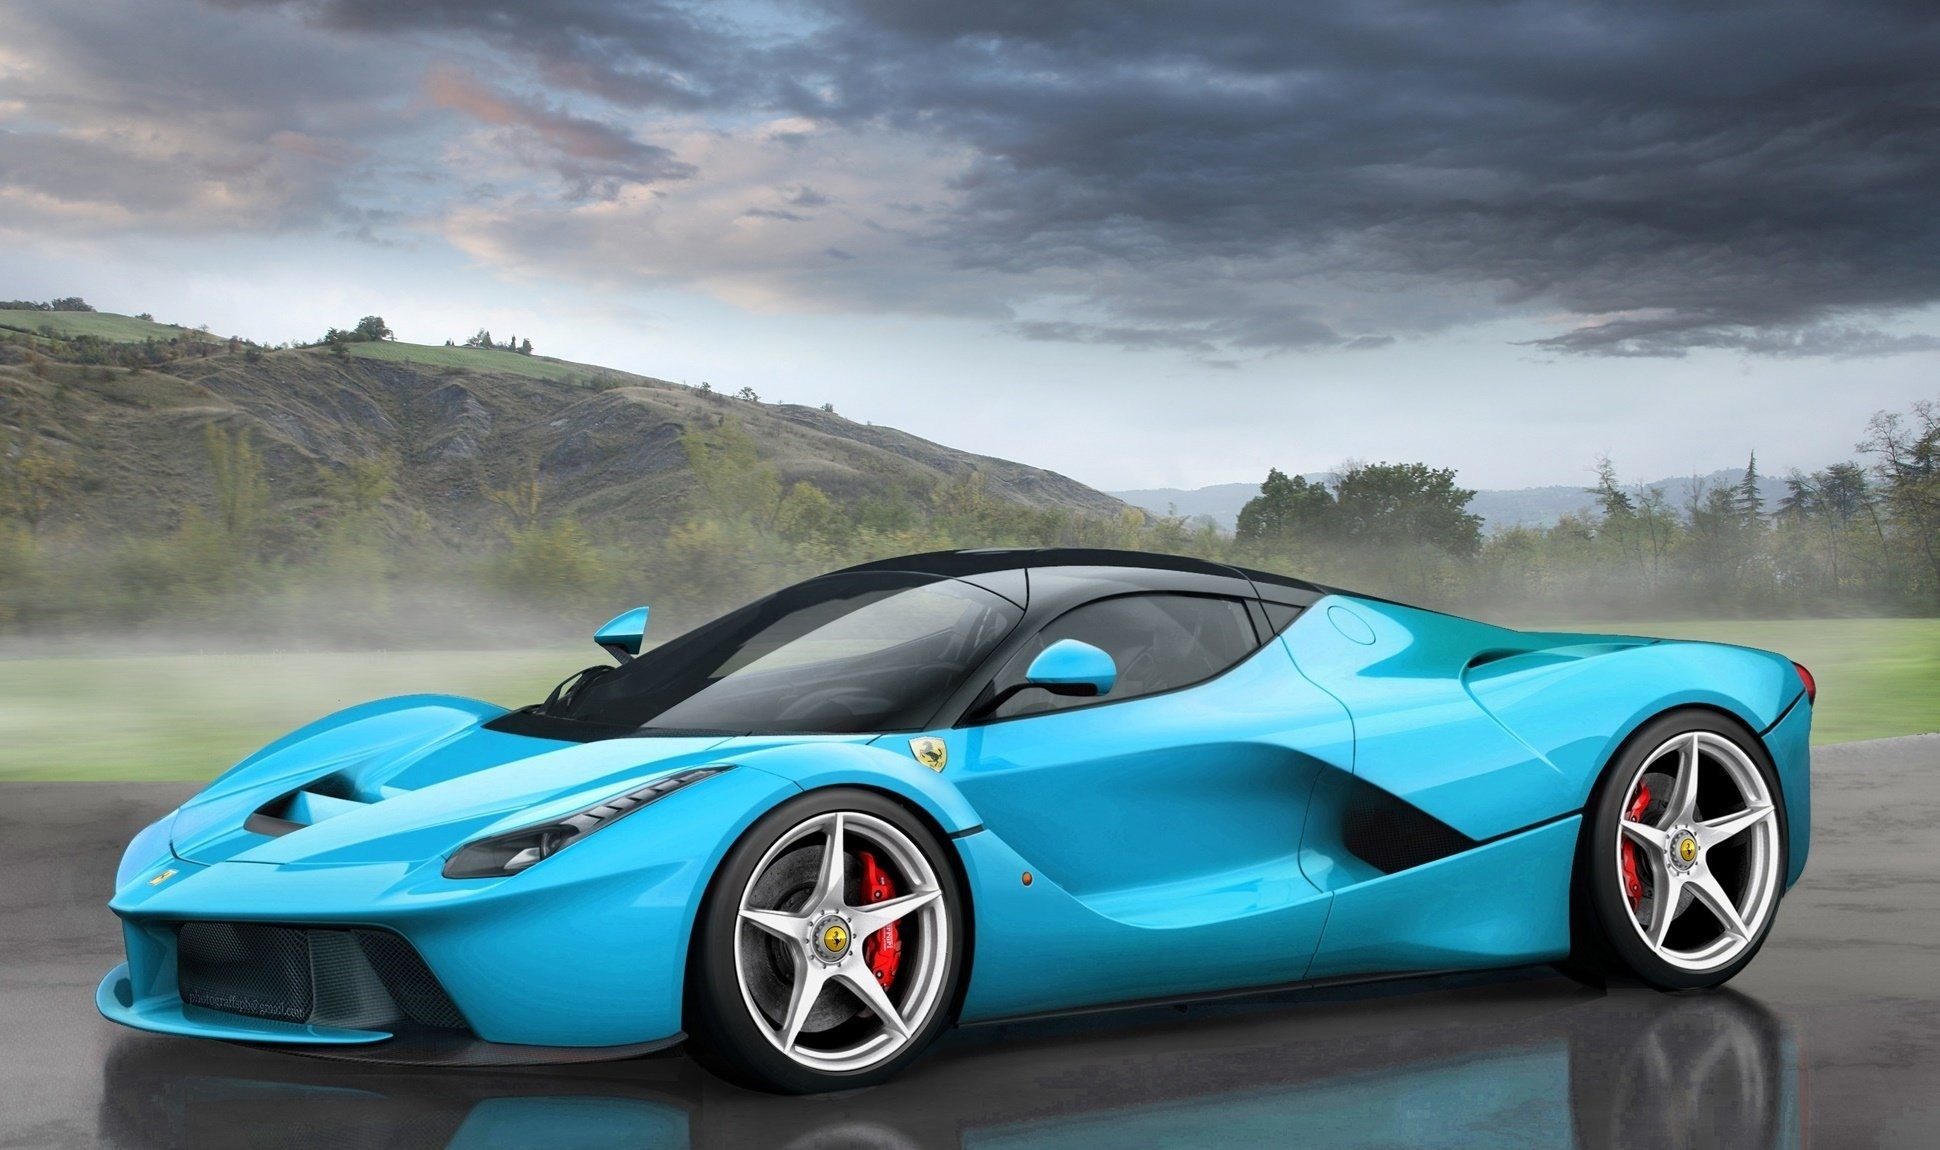 Ferrari Laferrari Wallpapers (77+ images)